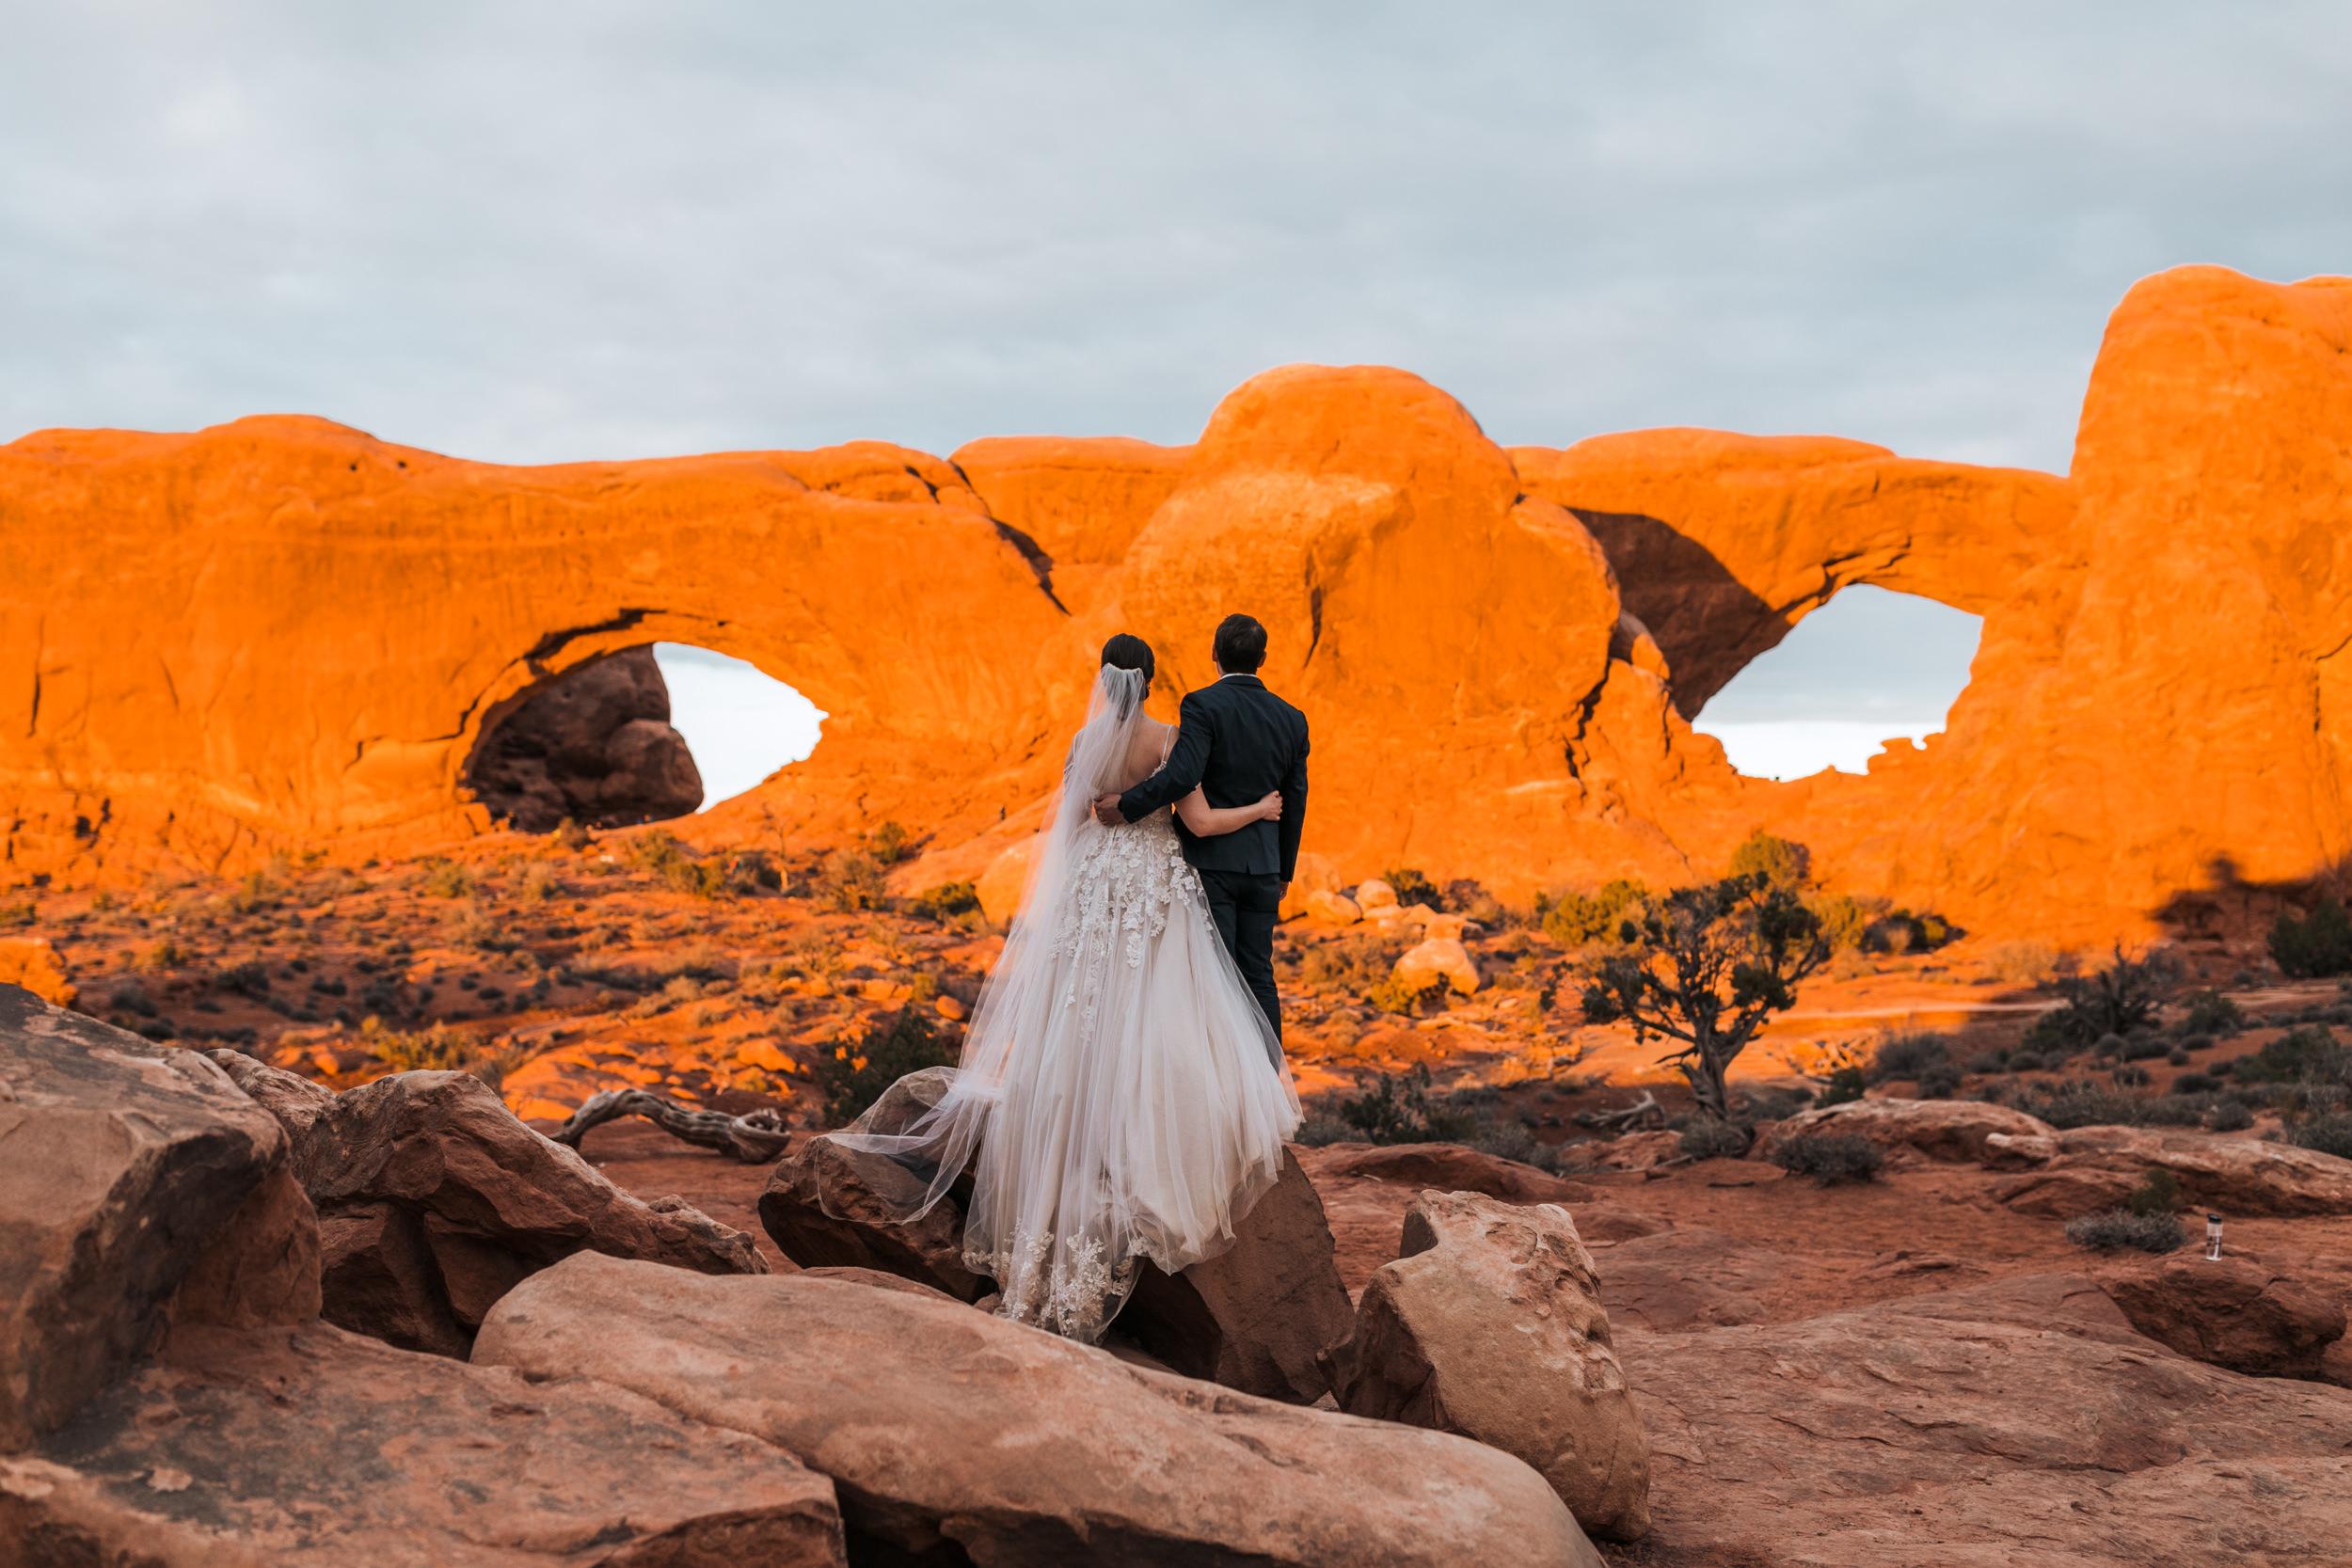 Hearnes-Elopement-Photography-Arches-national-park-moab-utah-wedding-1.jpg